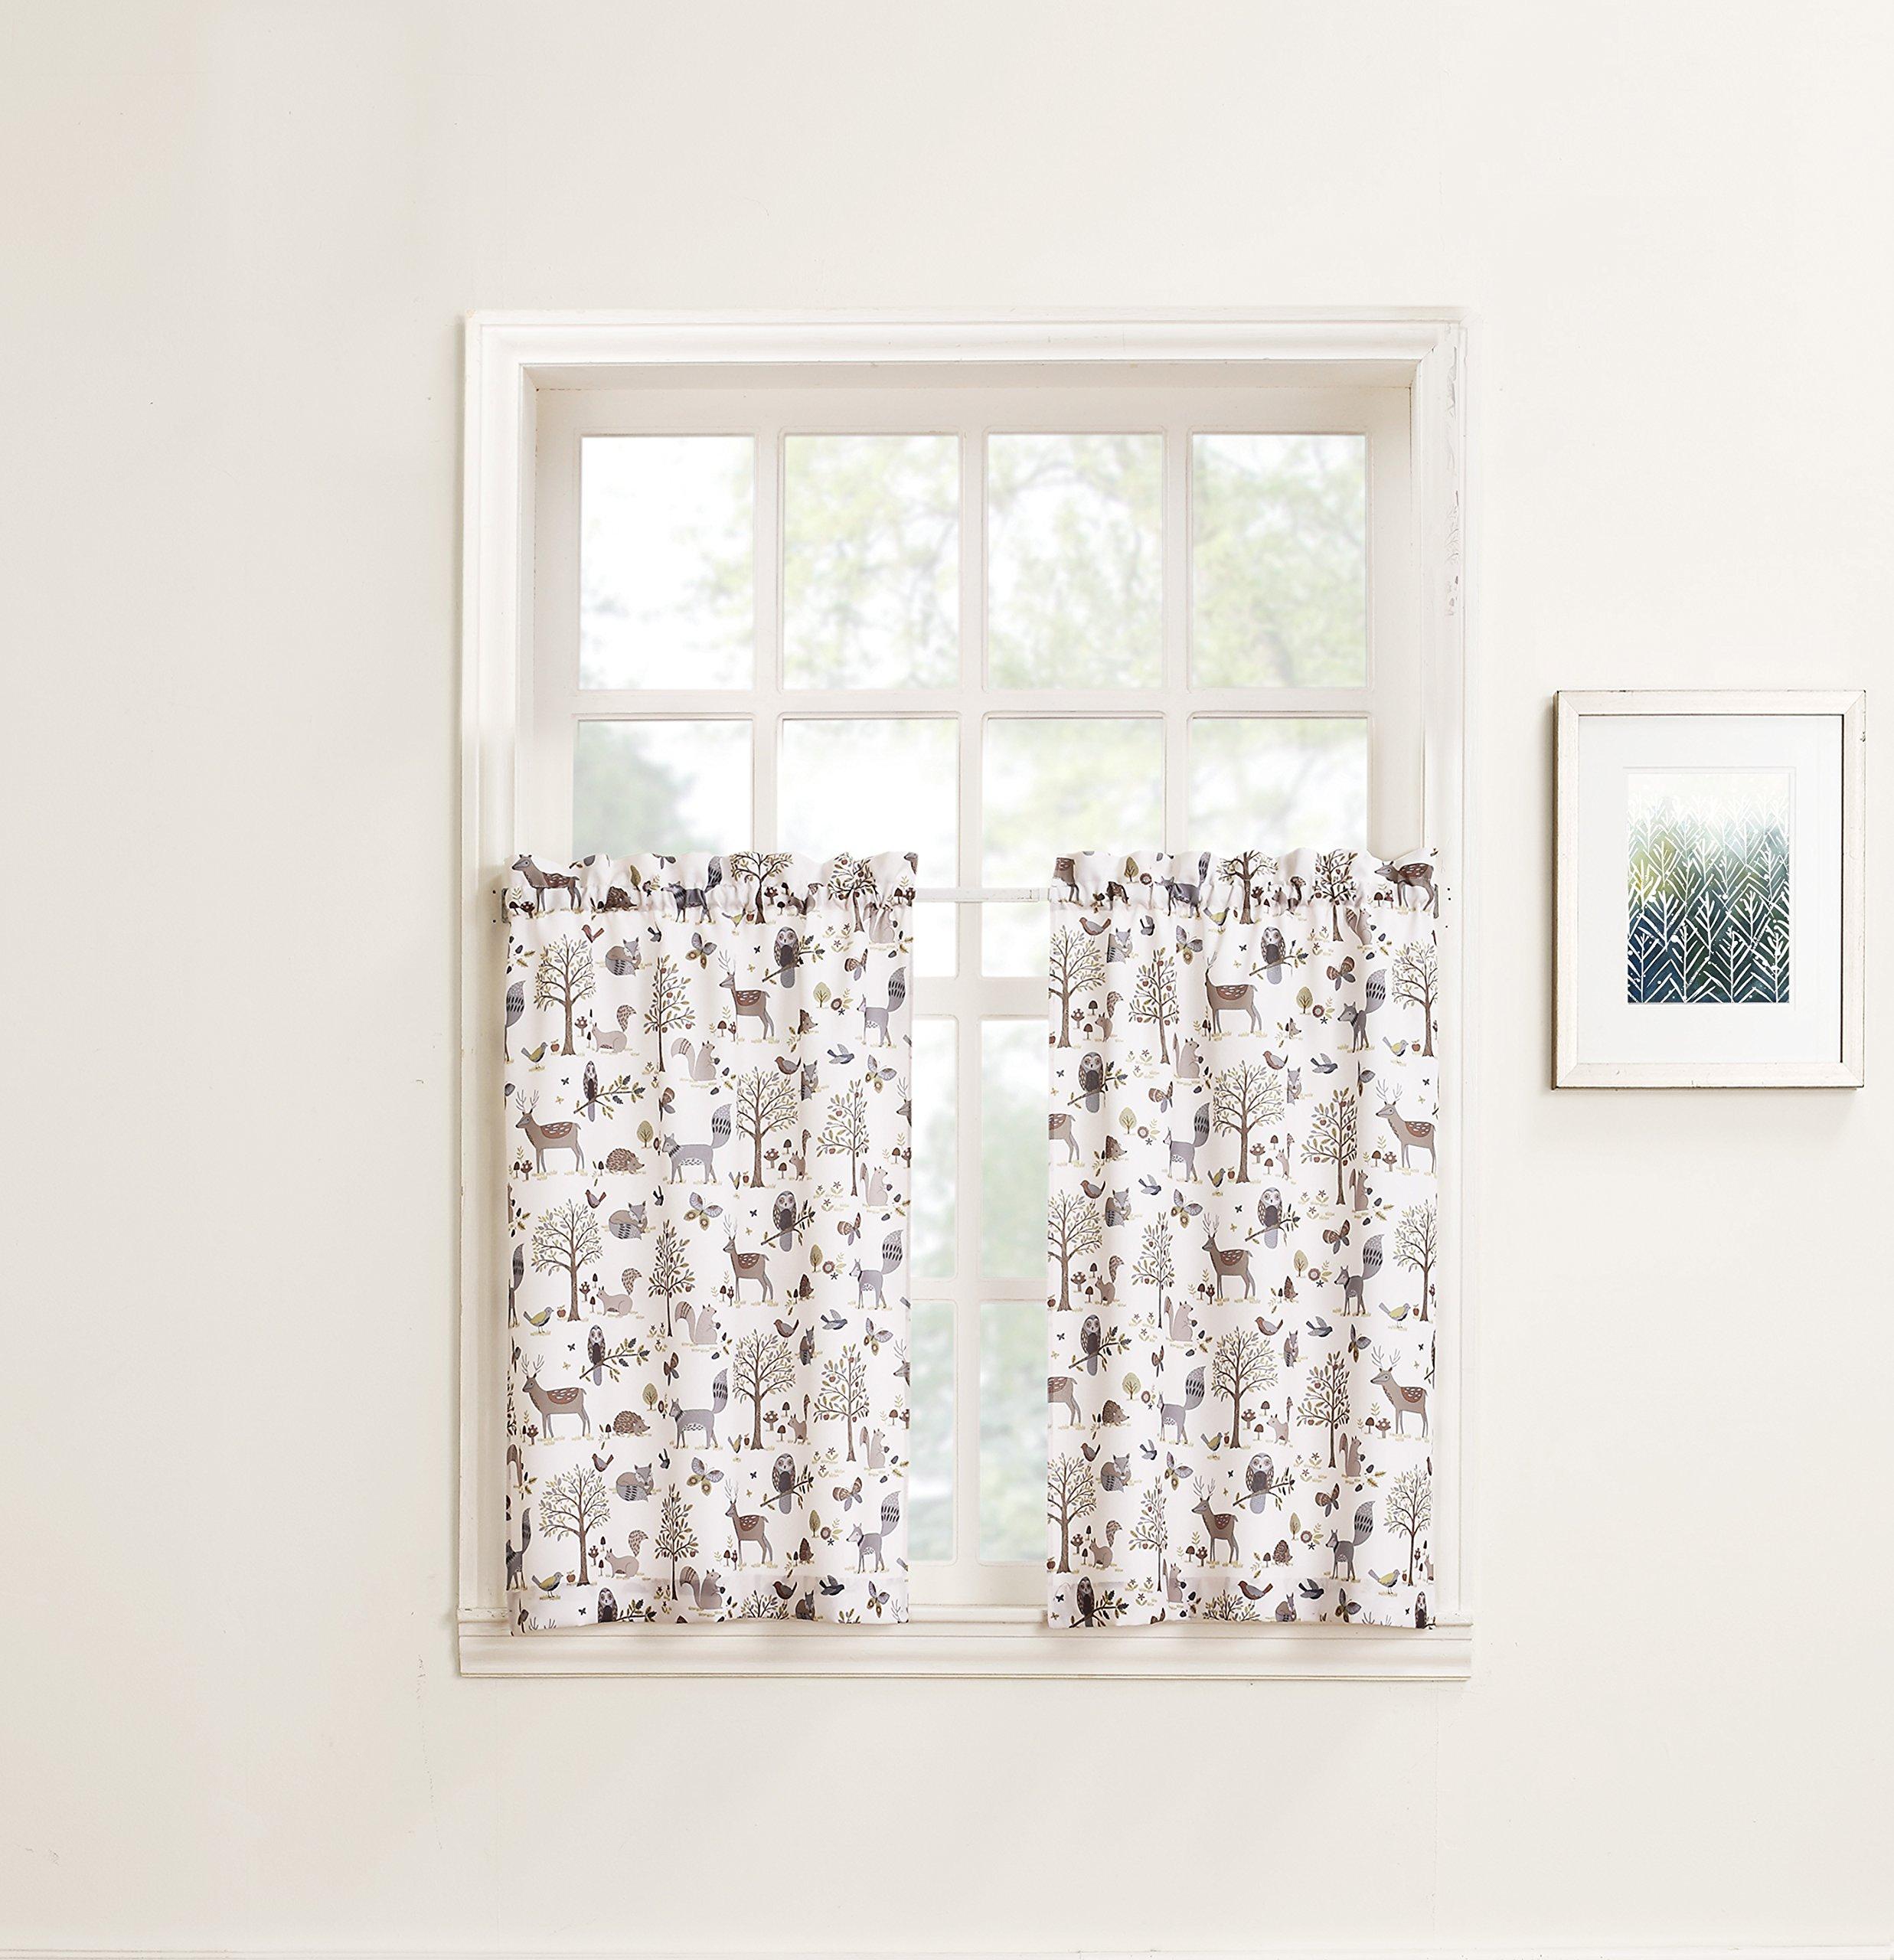 No. 918 Forest Friends Animal Kitchen Curtain Tier Pair, 56'' x 36'', Ivory White